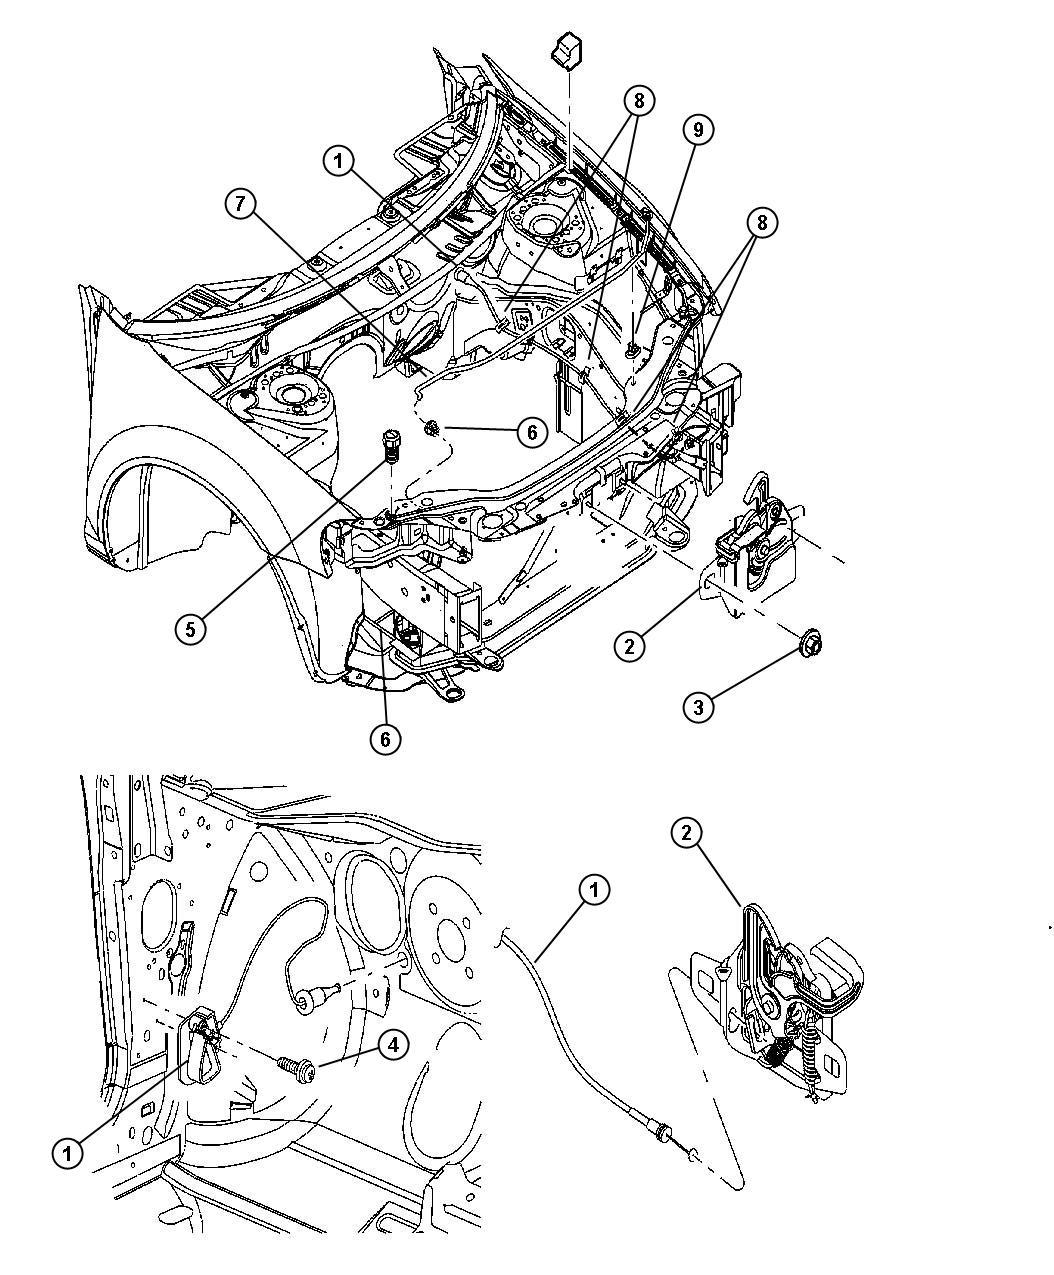 Chrysler Pacifica Bushing. Hood prop rod pivot